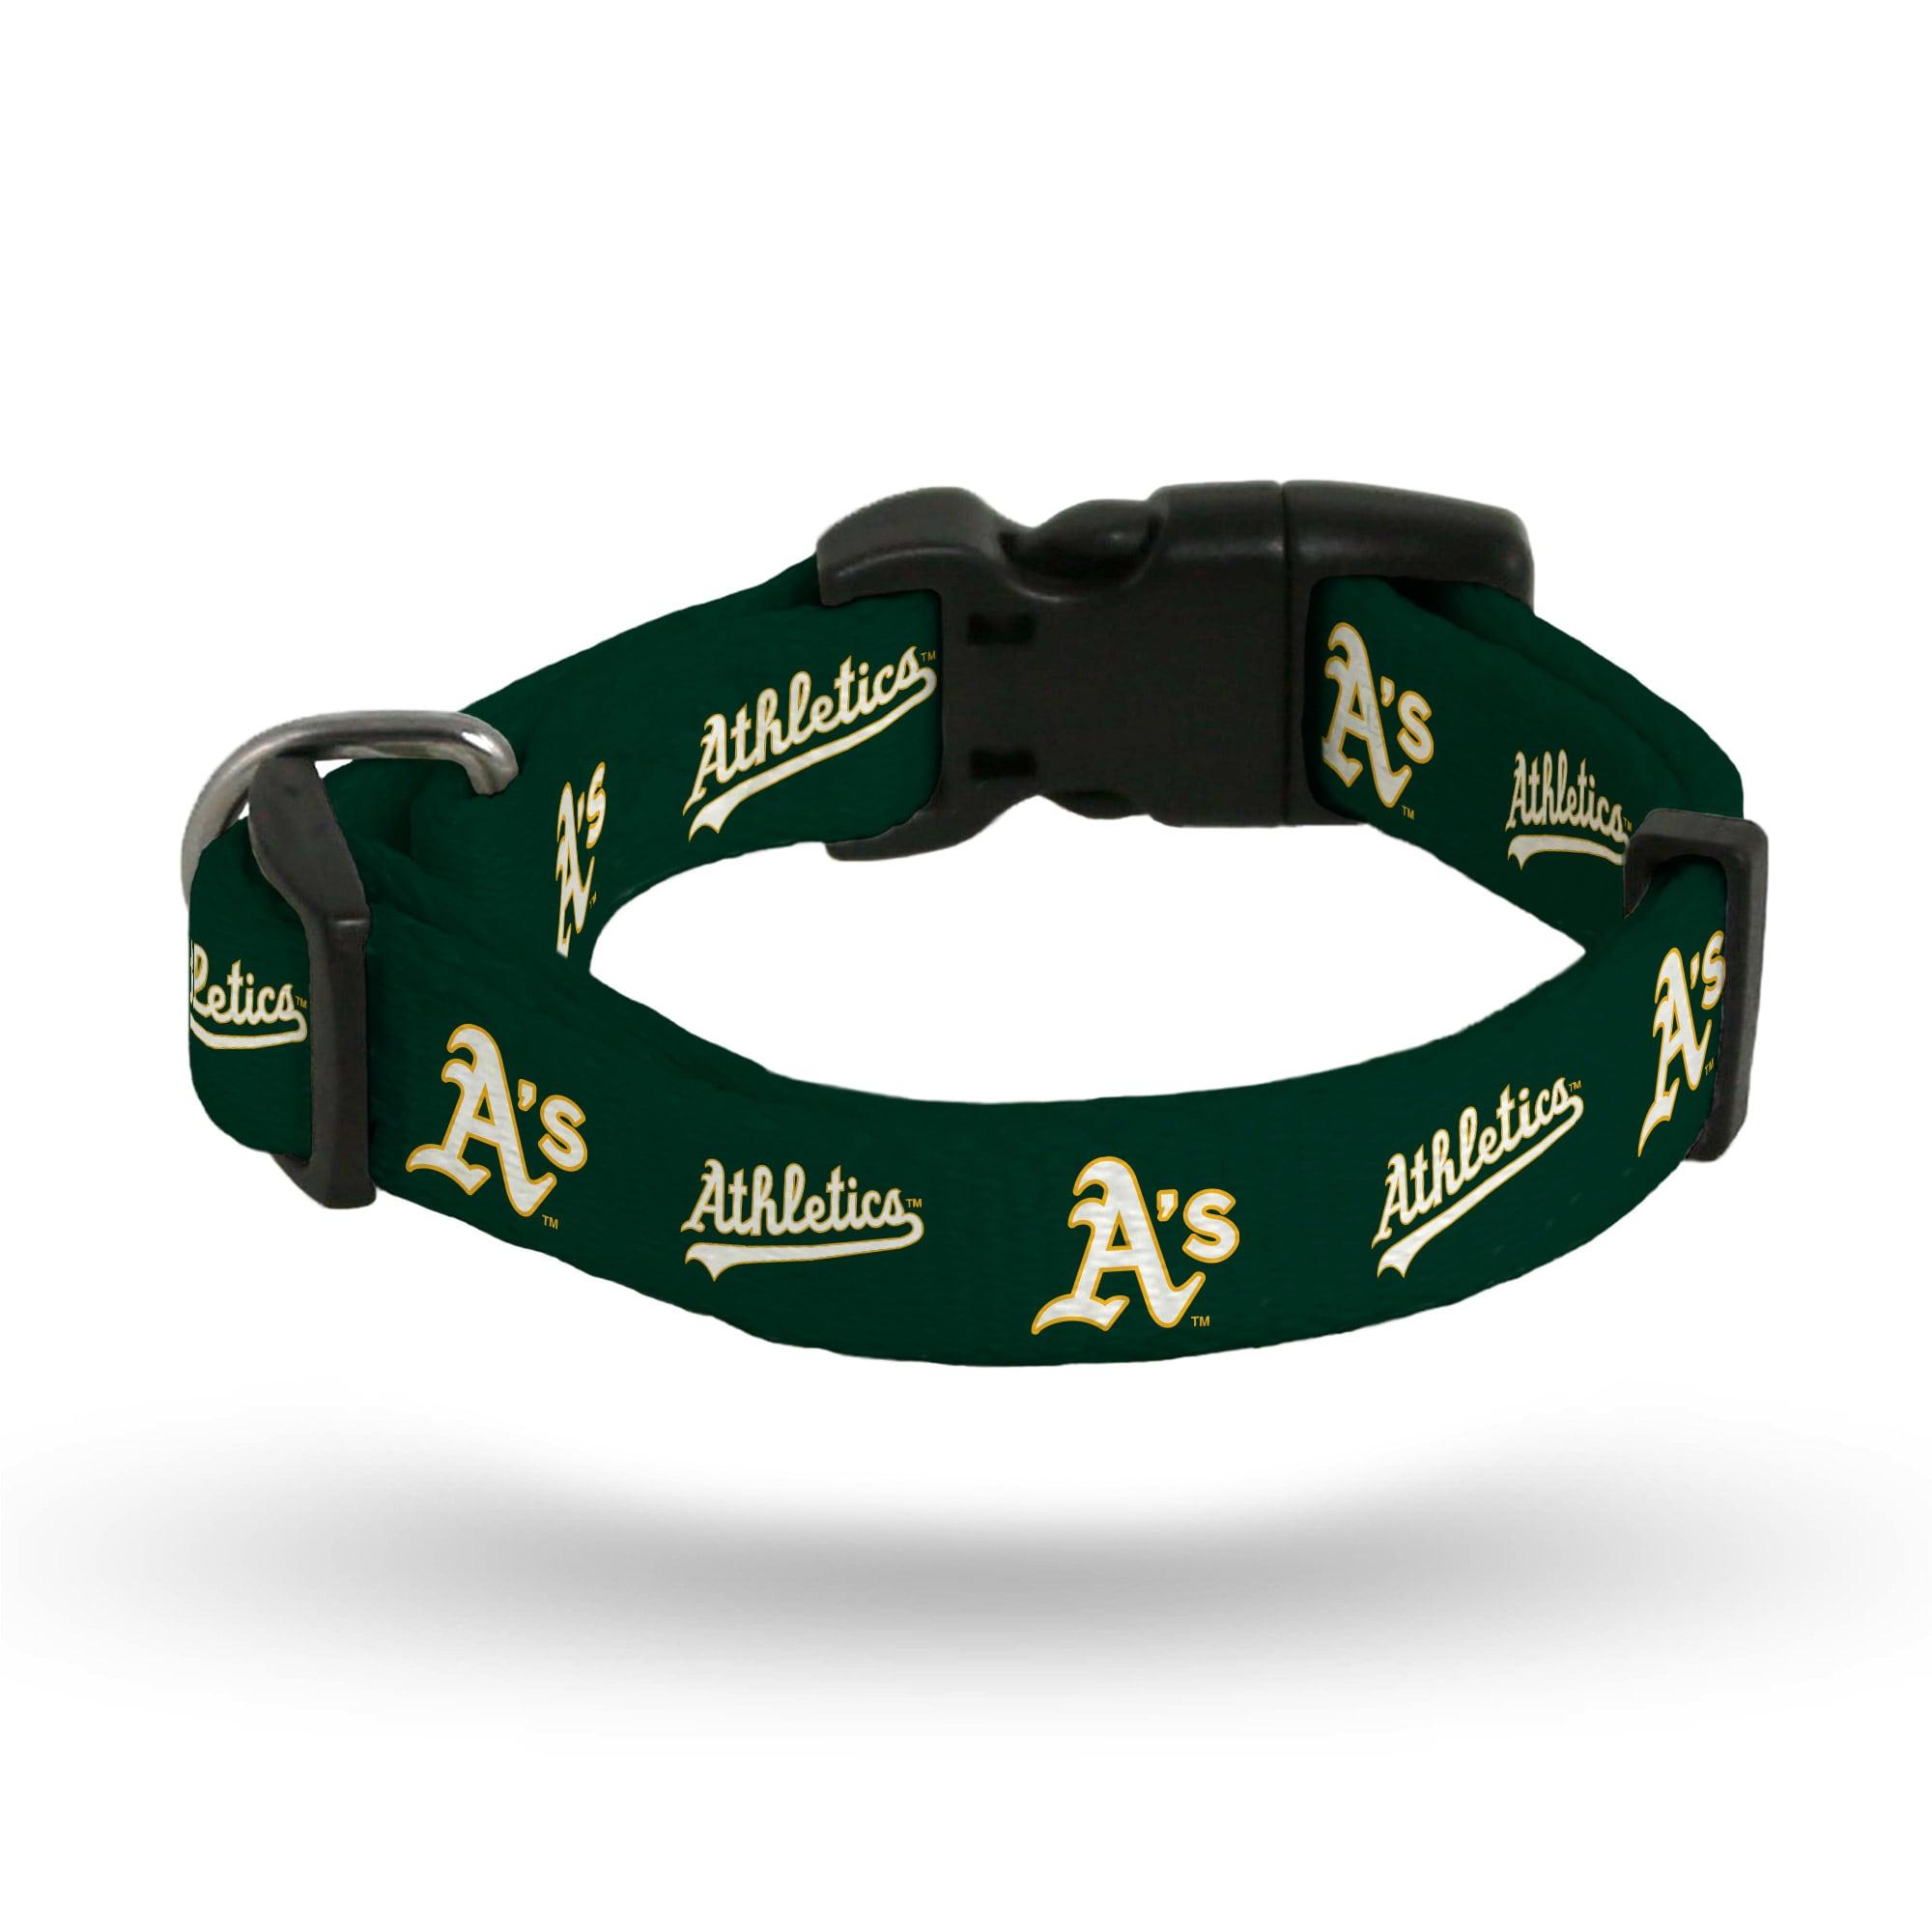 Oakland Athletics Sparo Rugged Pet Collar